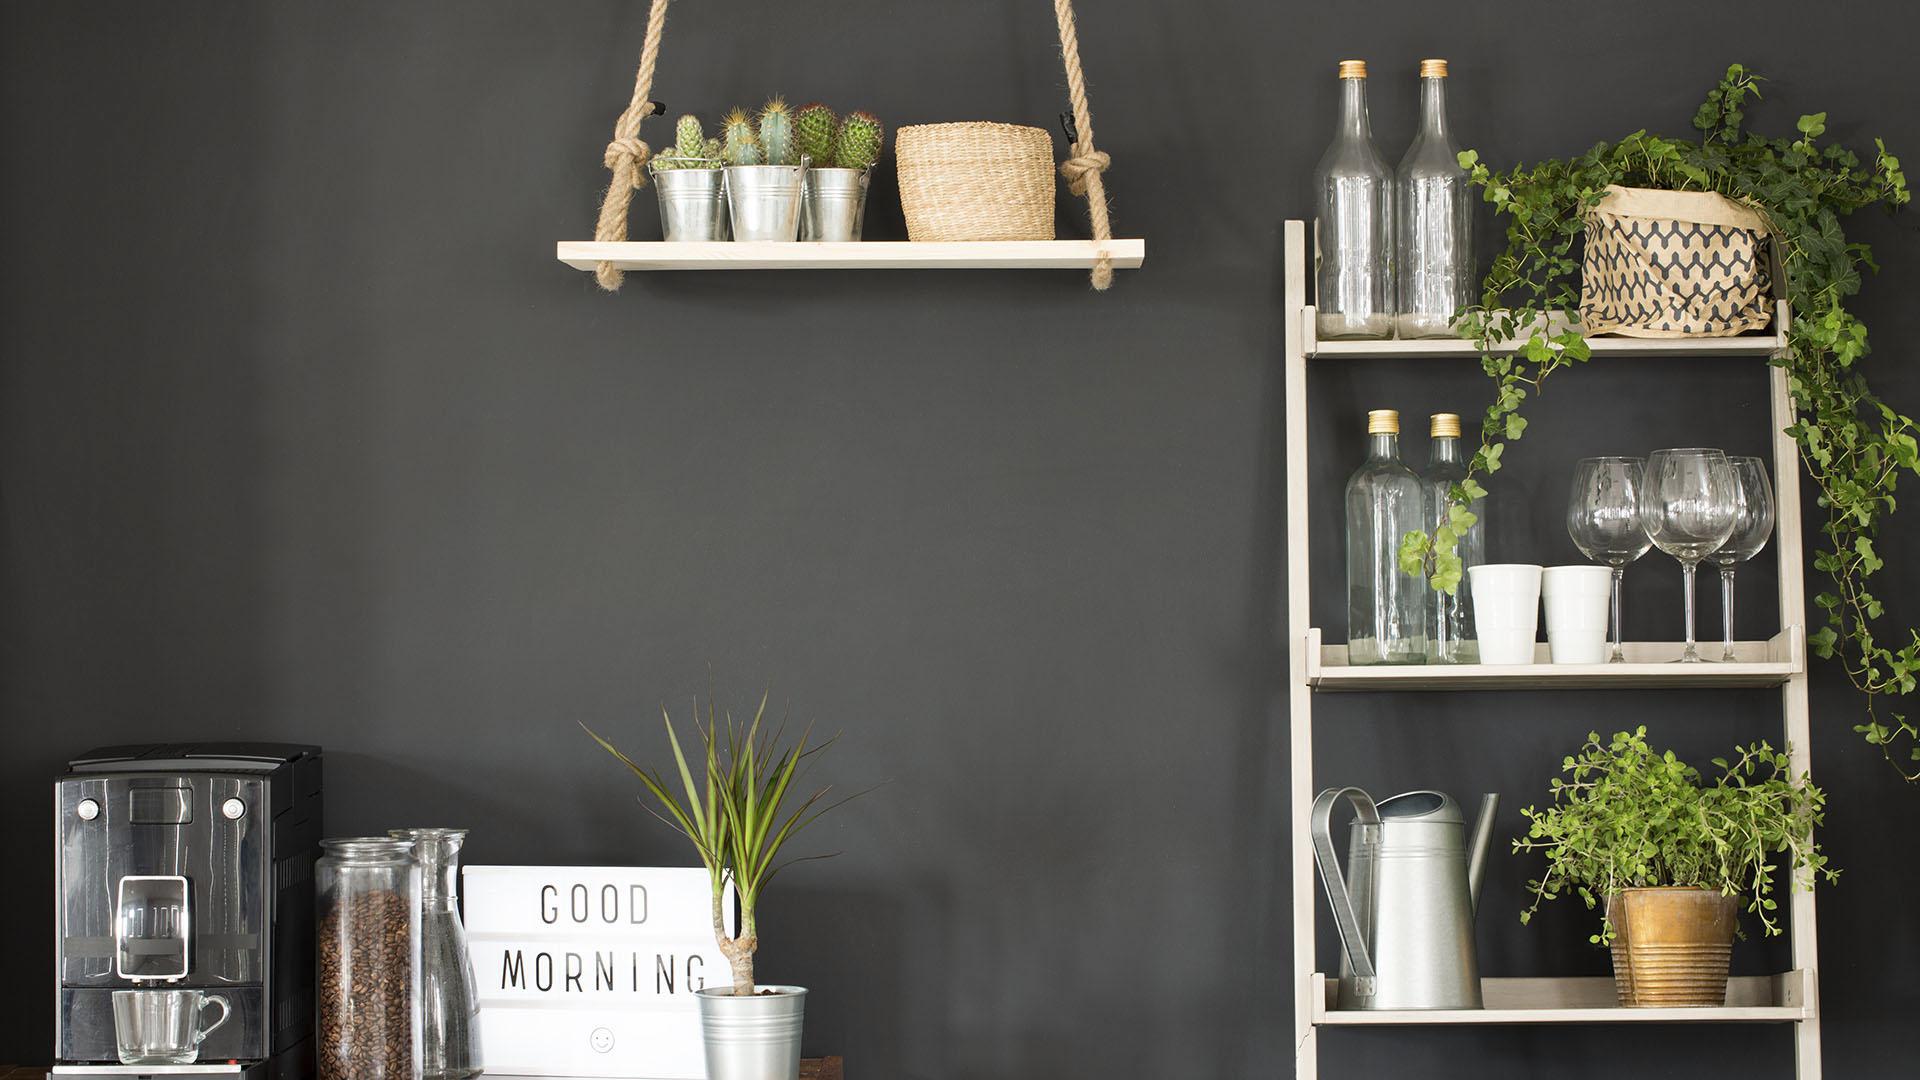 Our favourite kitchen plants